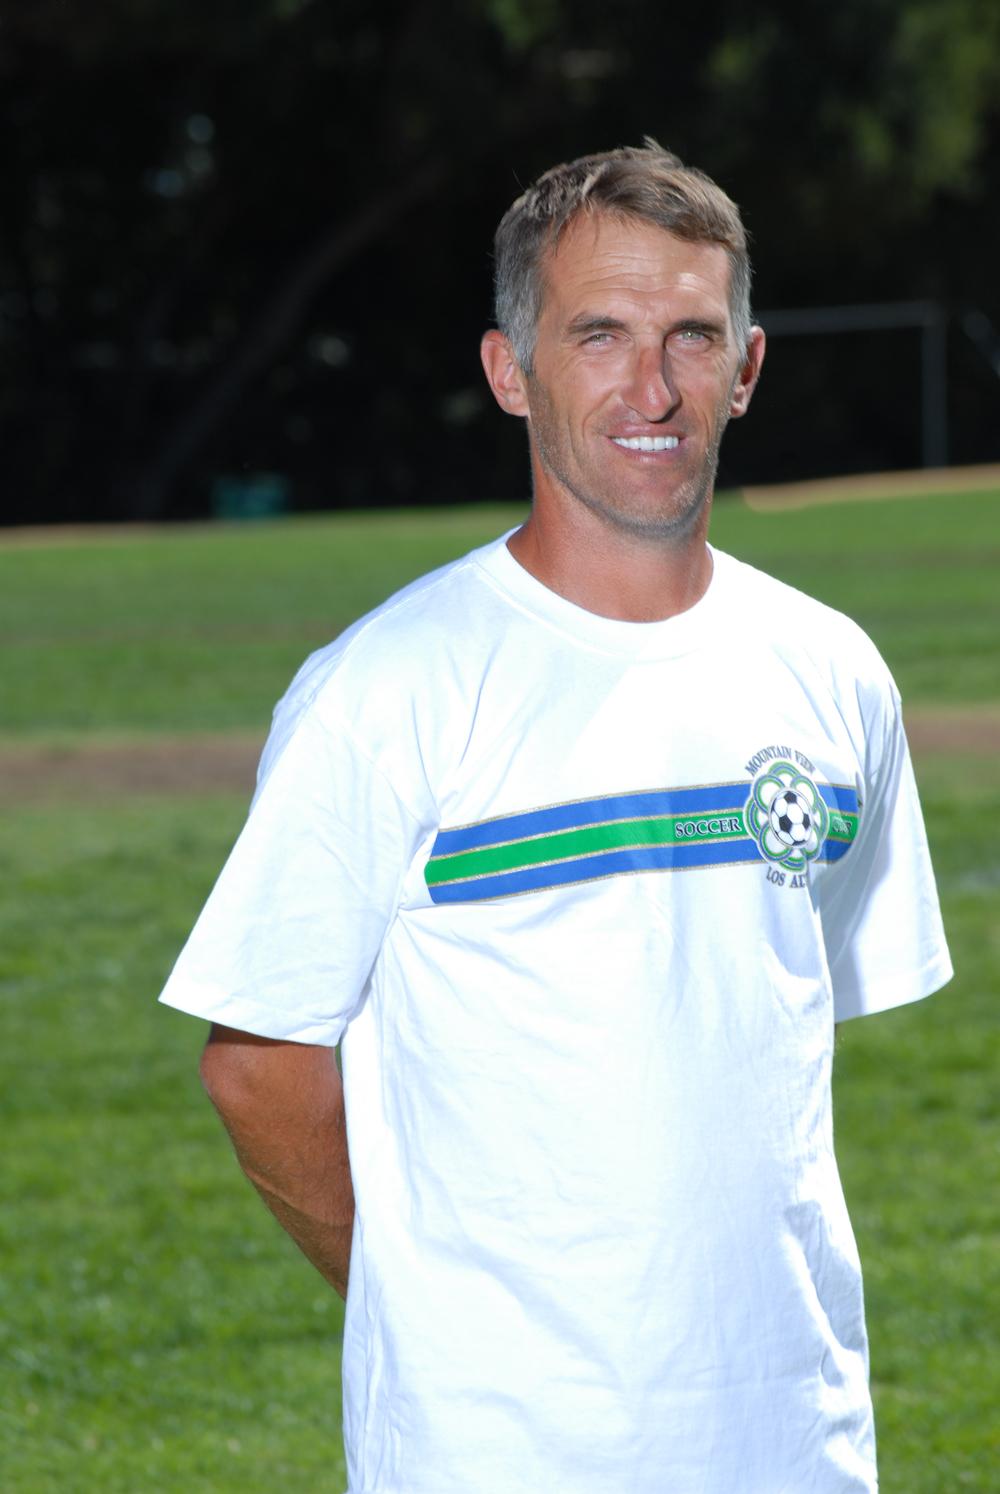 Seth Alberico